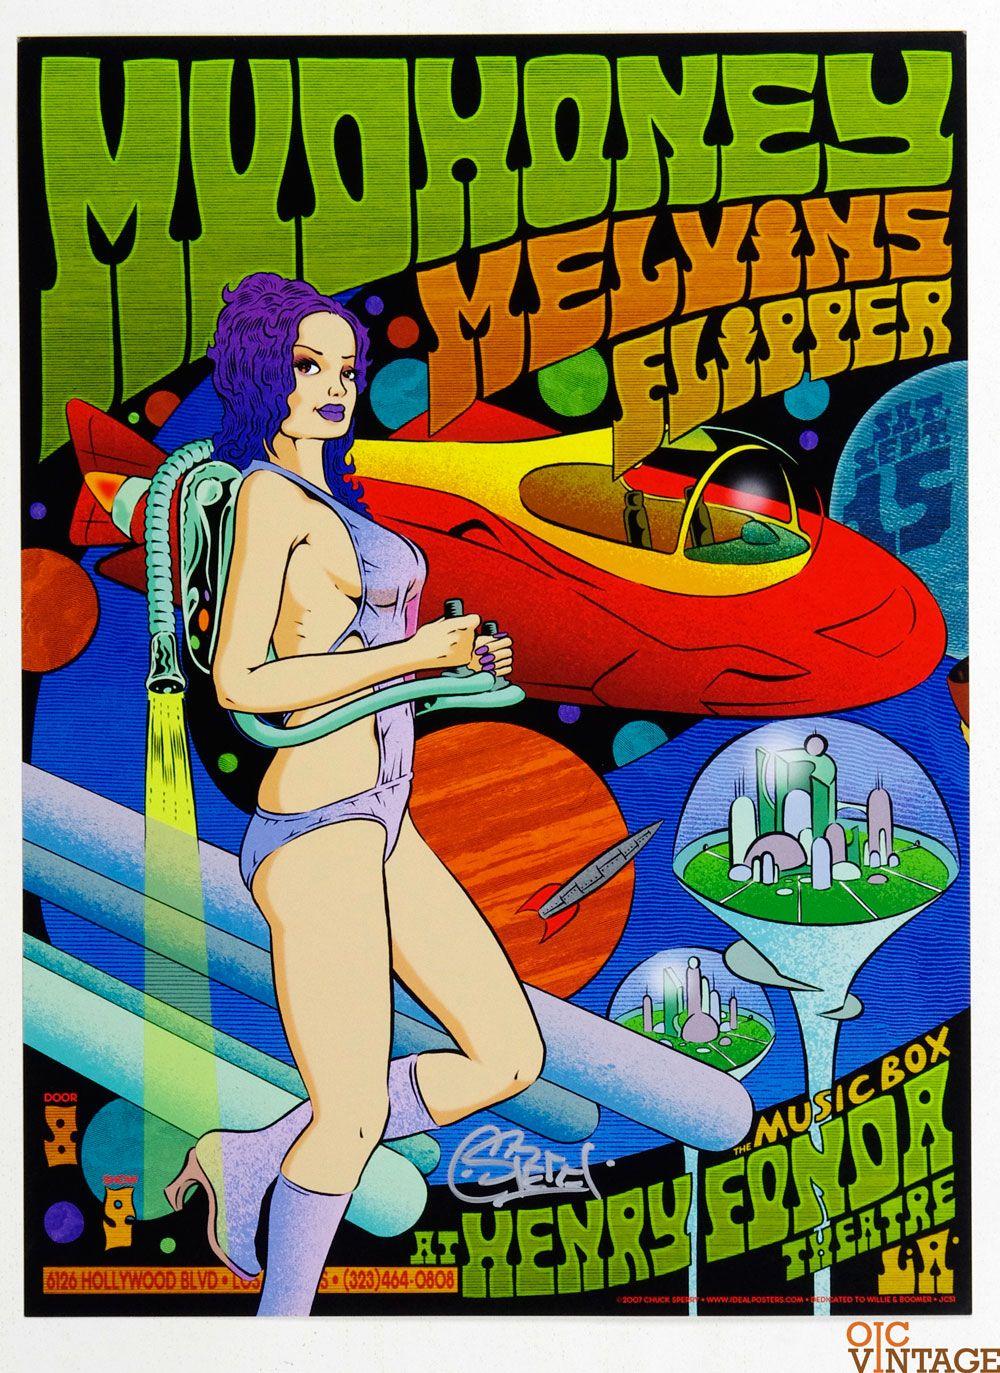 Melvins 2007 Sep 15 Henry Fonda Theatre Poster Chuck Sperry Signed